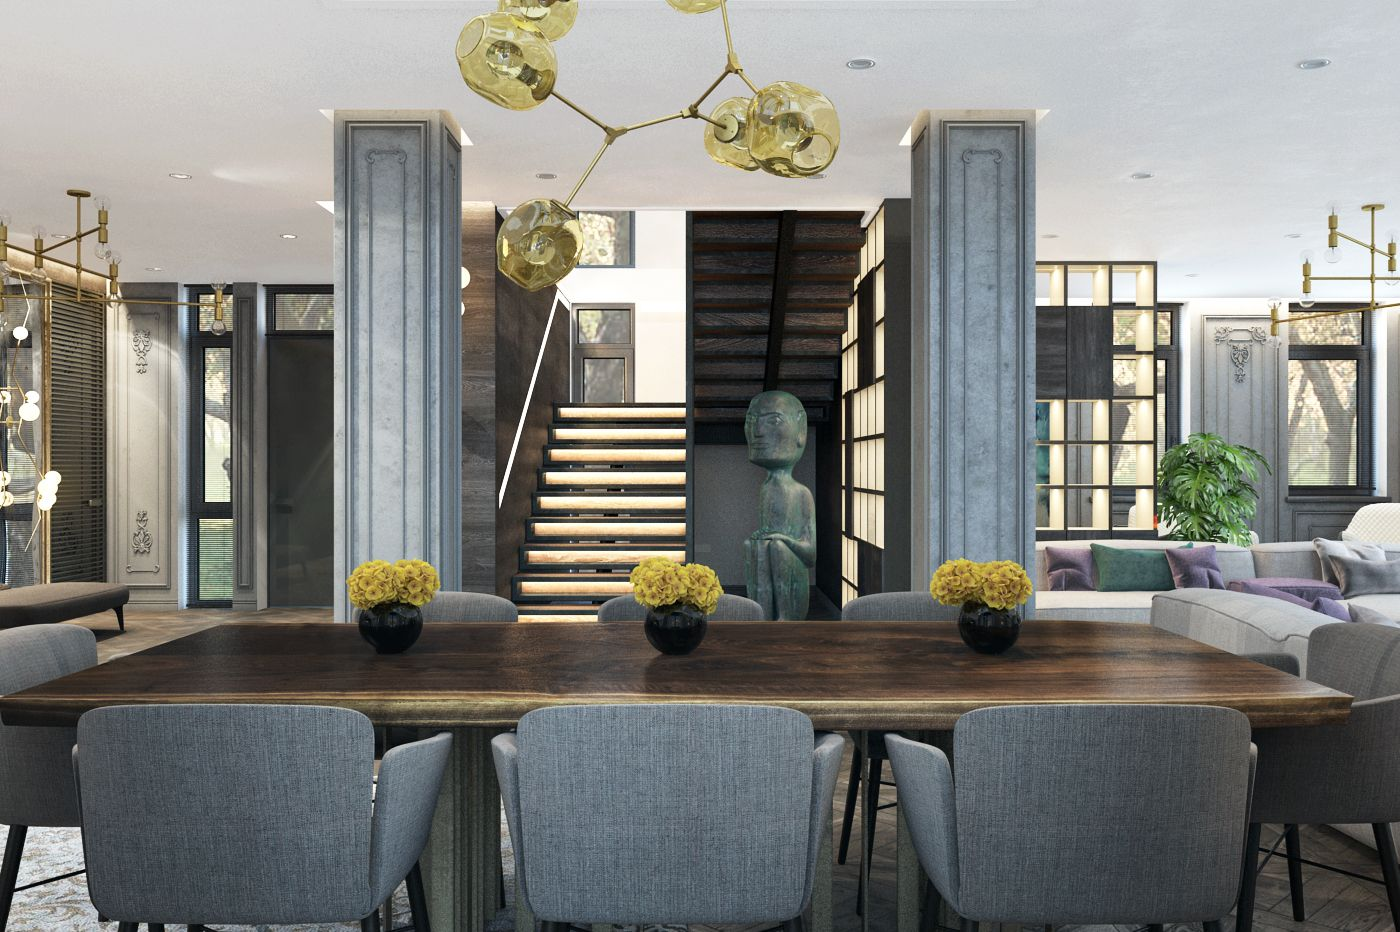 P-house interior on Behance